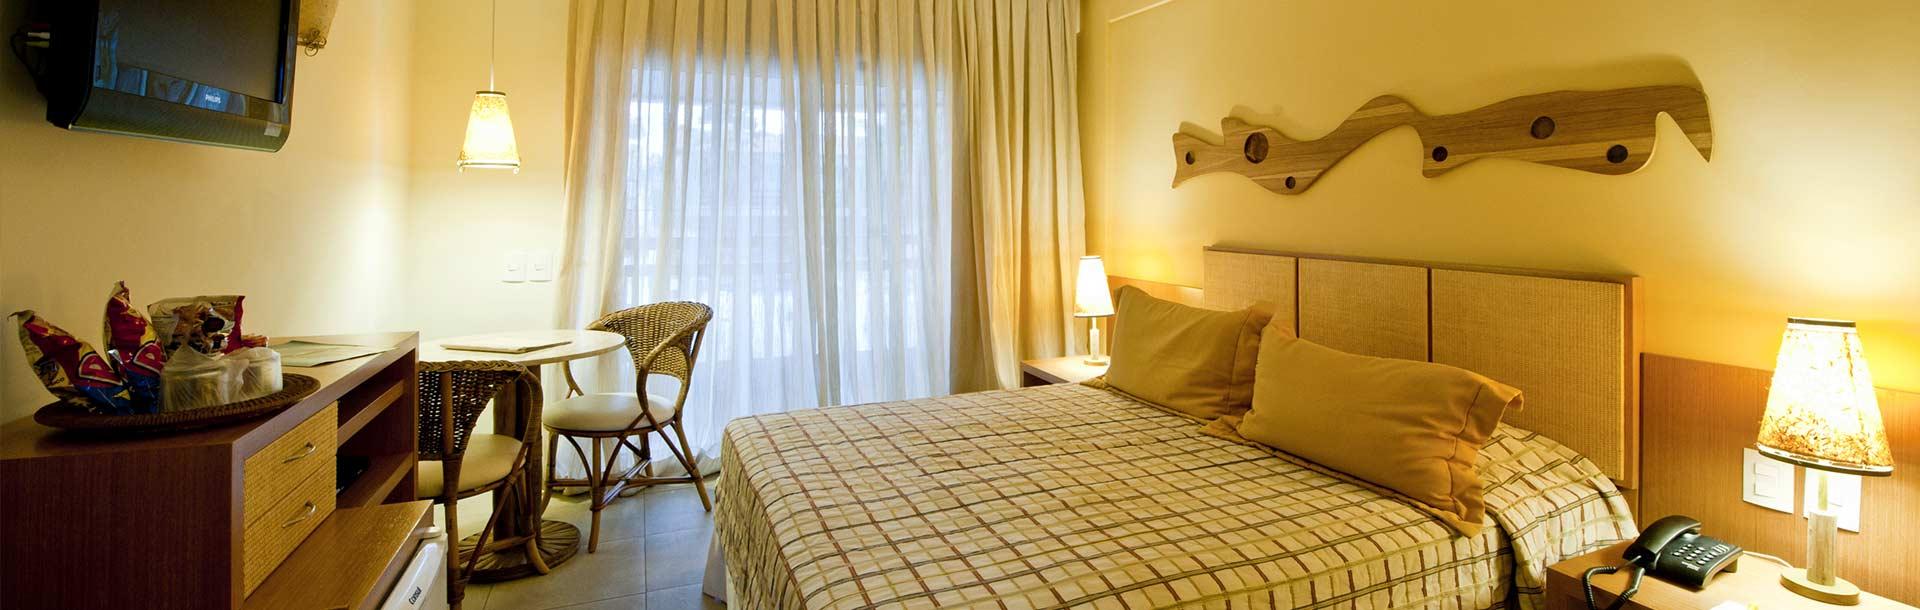 slider-interno-pontalmar-praia-hotel-acomodacoes